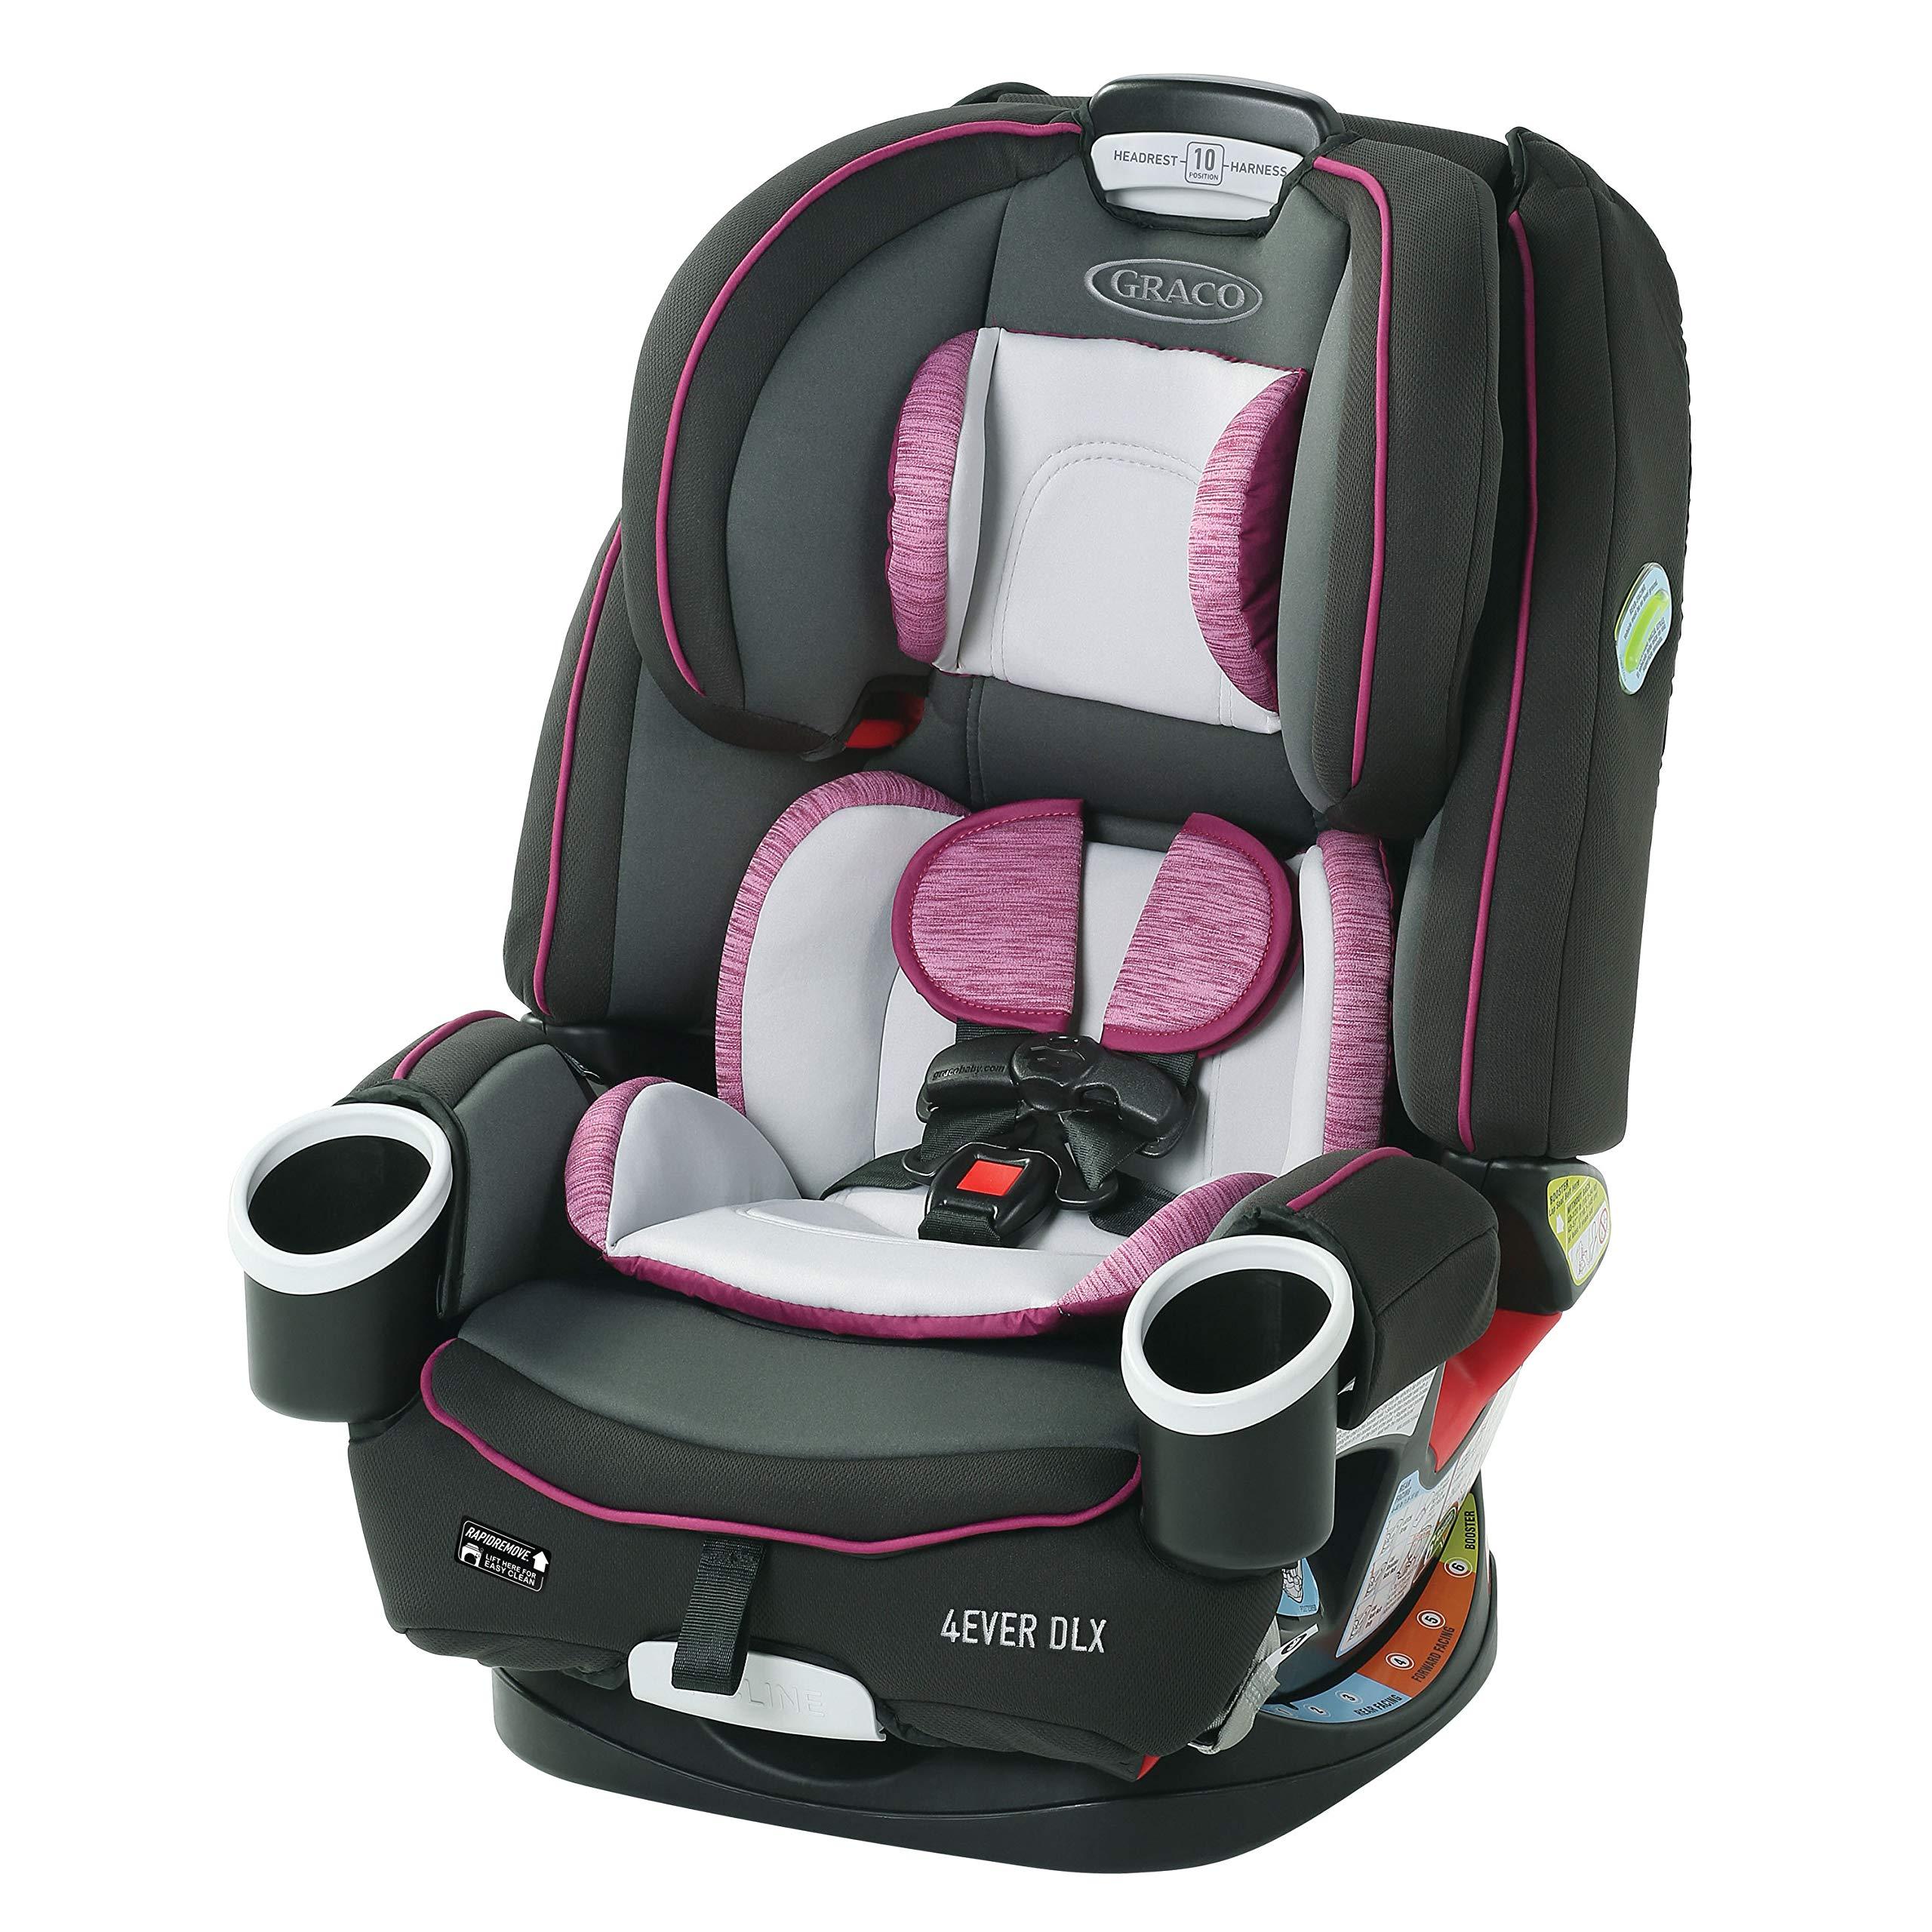 024d3b67b3a5 Galleon - Graco 4Ever DLX 4-in-1 Car Seat